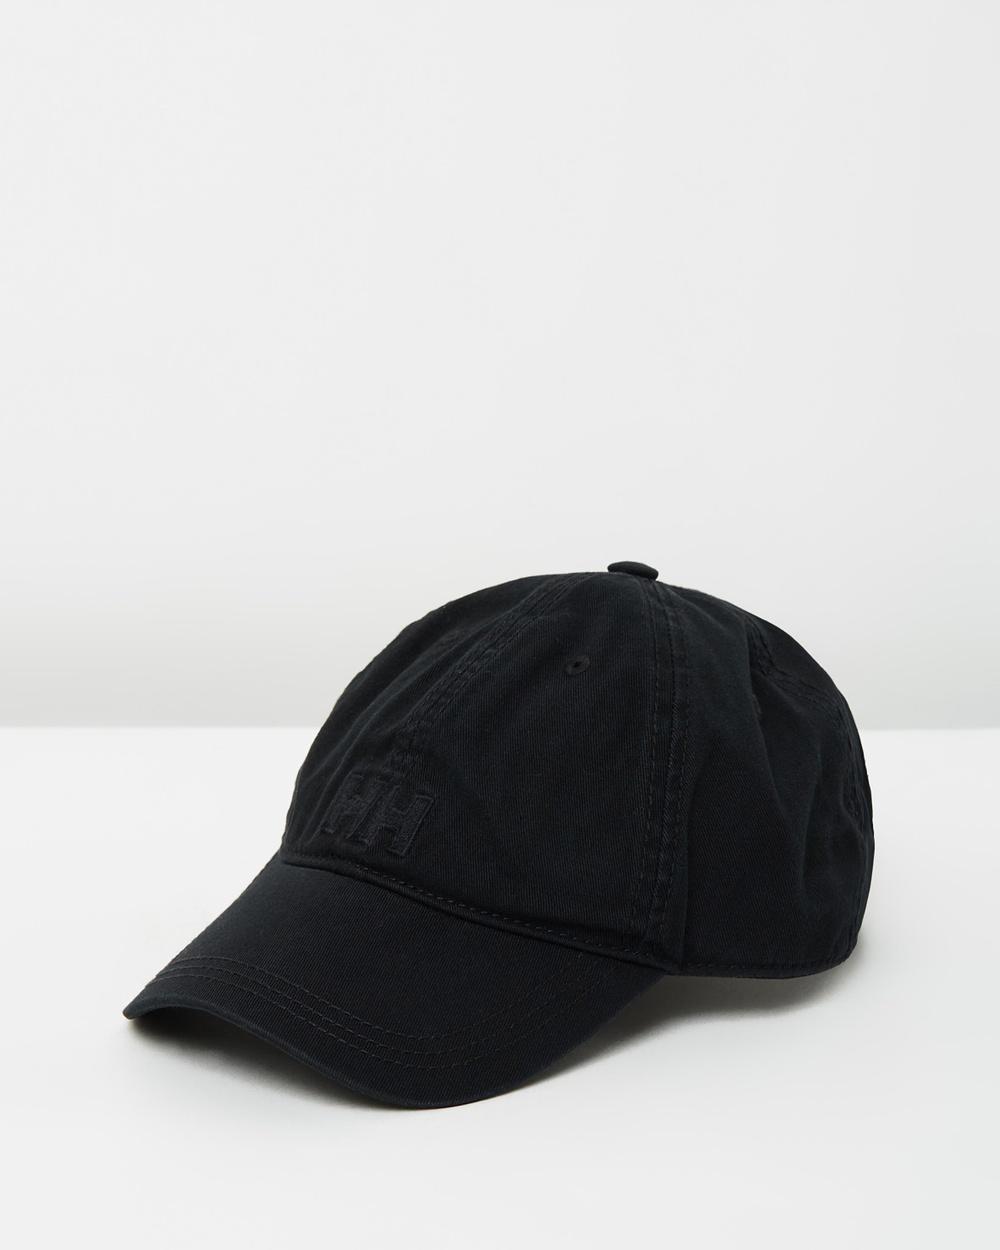 Helly Hansen Logo Cap Headwear Black Caps Australia